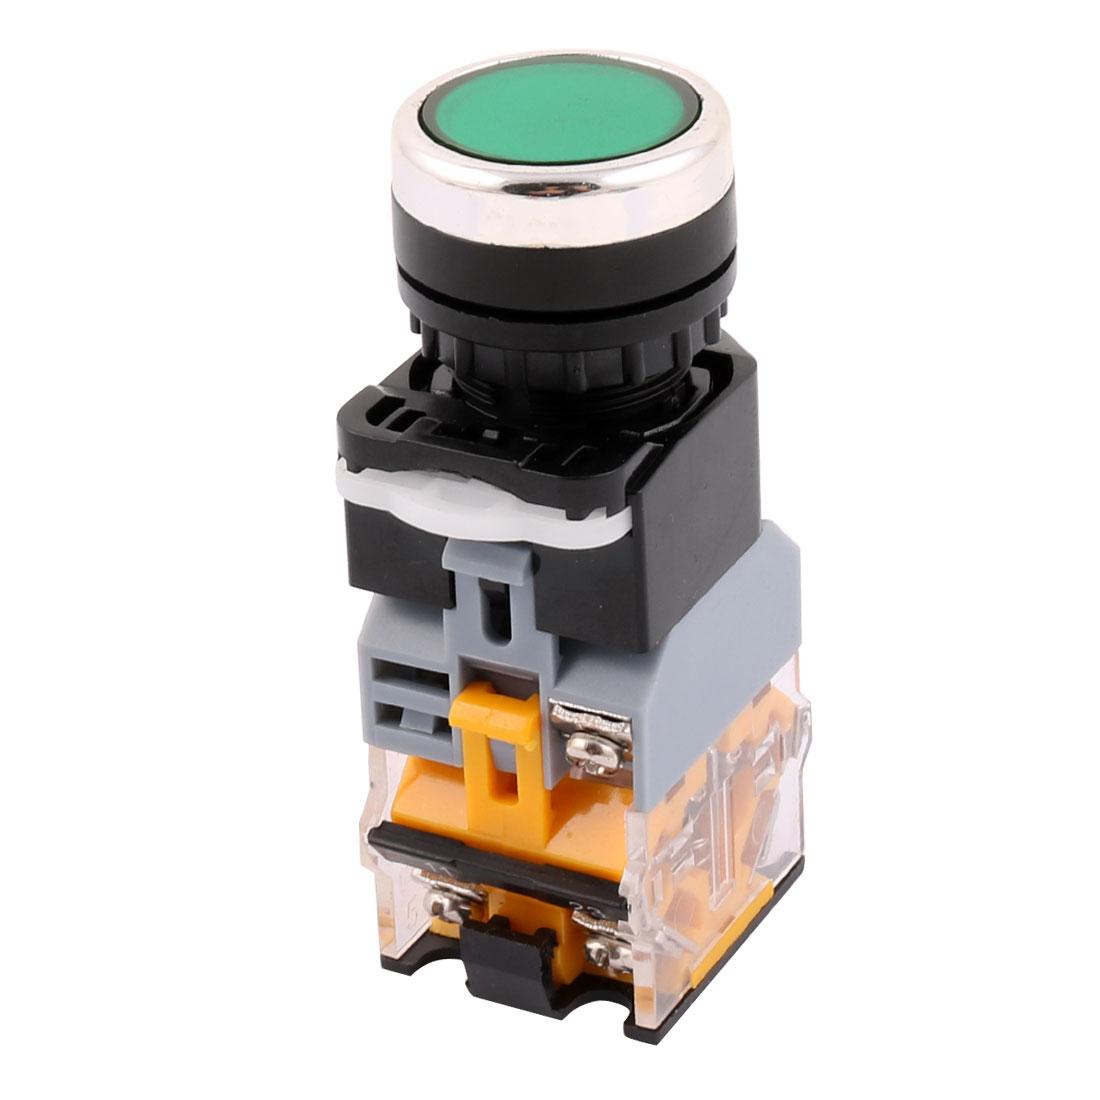 DC 24V Push Button Switch AC 380V 10A 1 NO + 1 NC Switch w Light